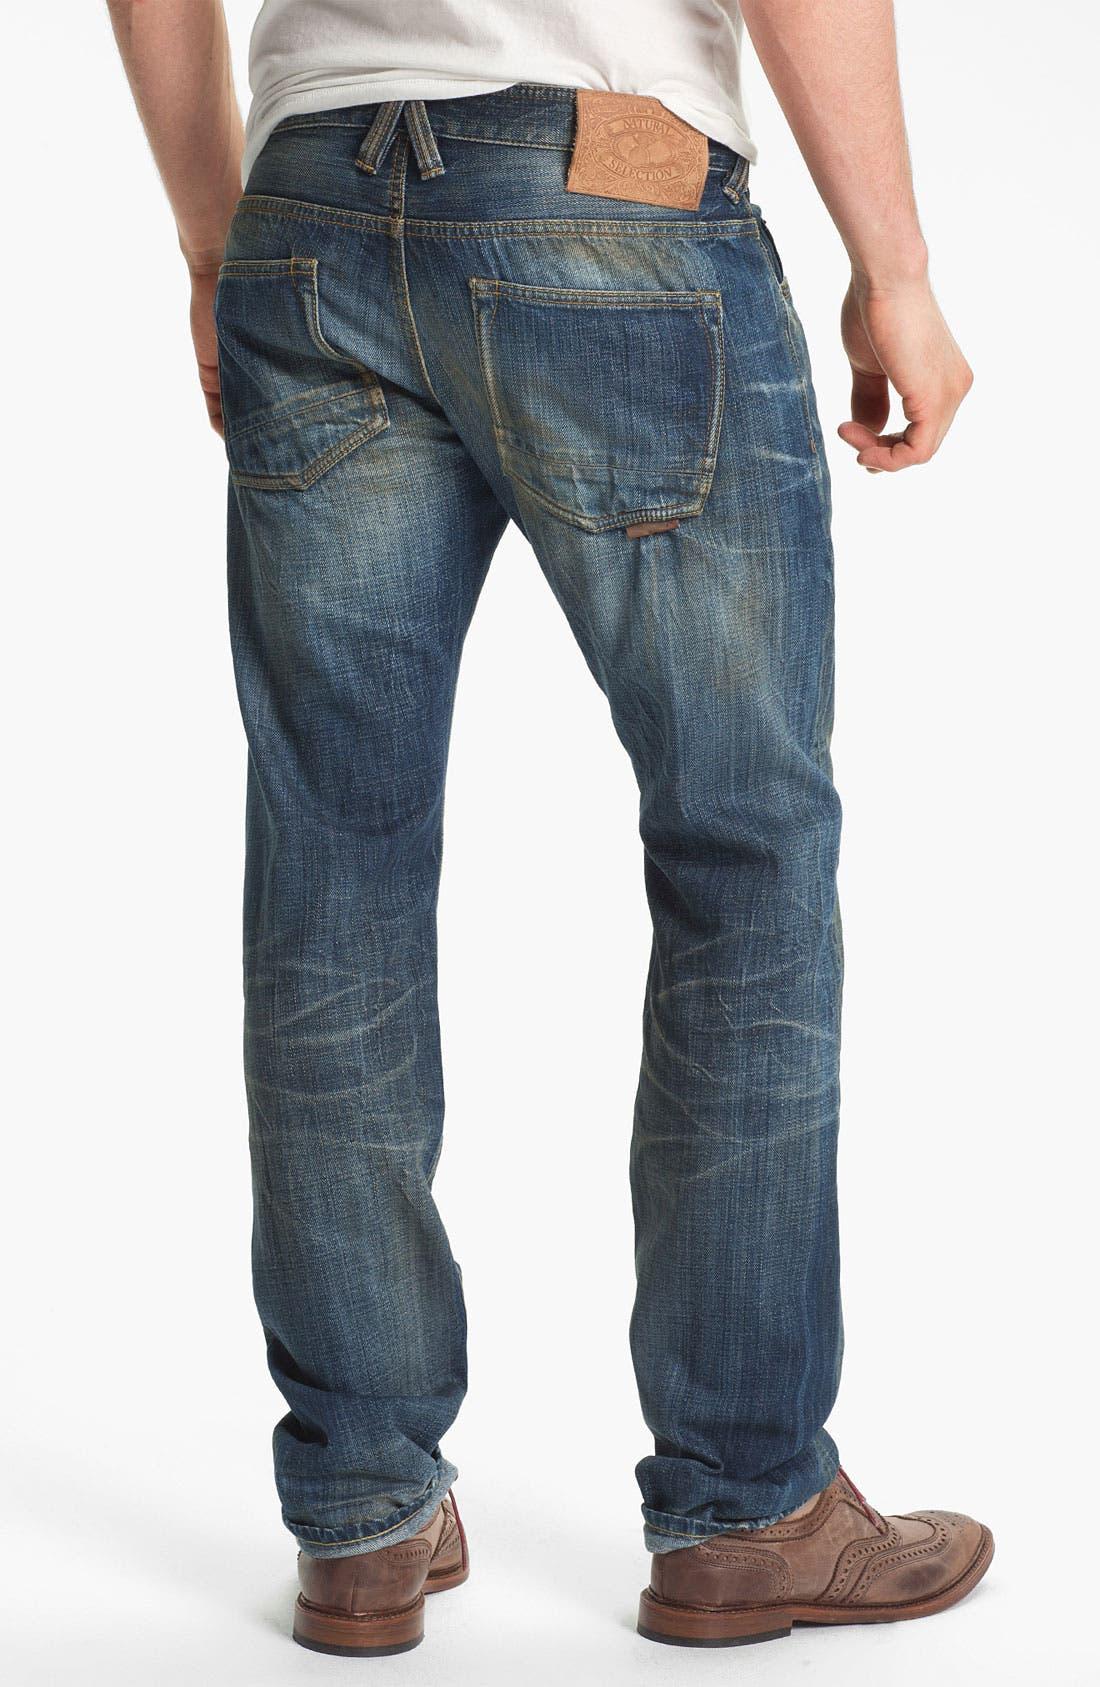 Main Image - Natural Selection Denim 'Broken' Narrow Straight Leg Selvedge Jeans (Dune)